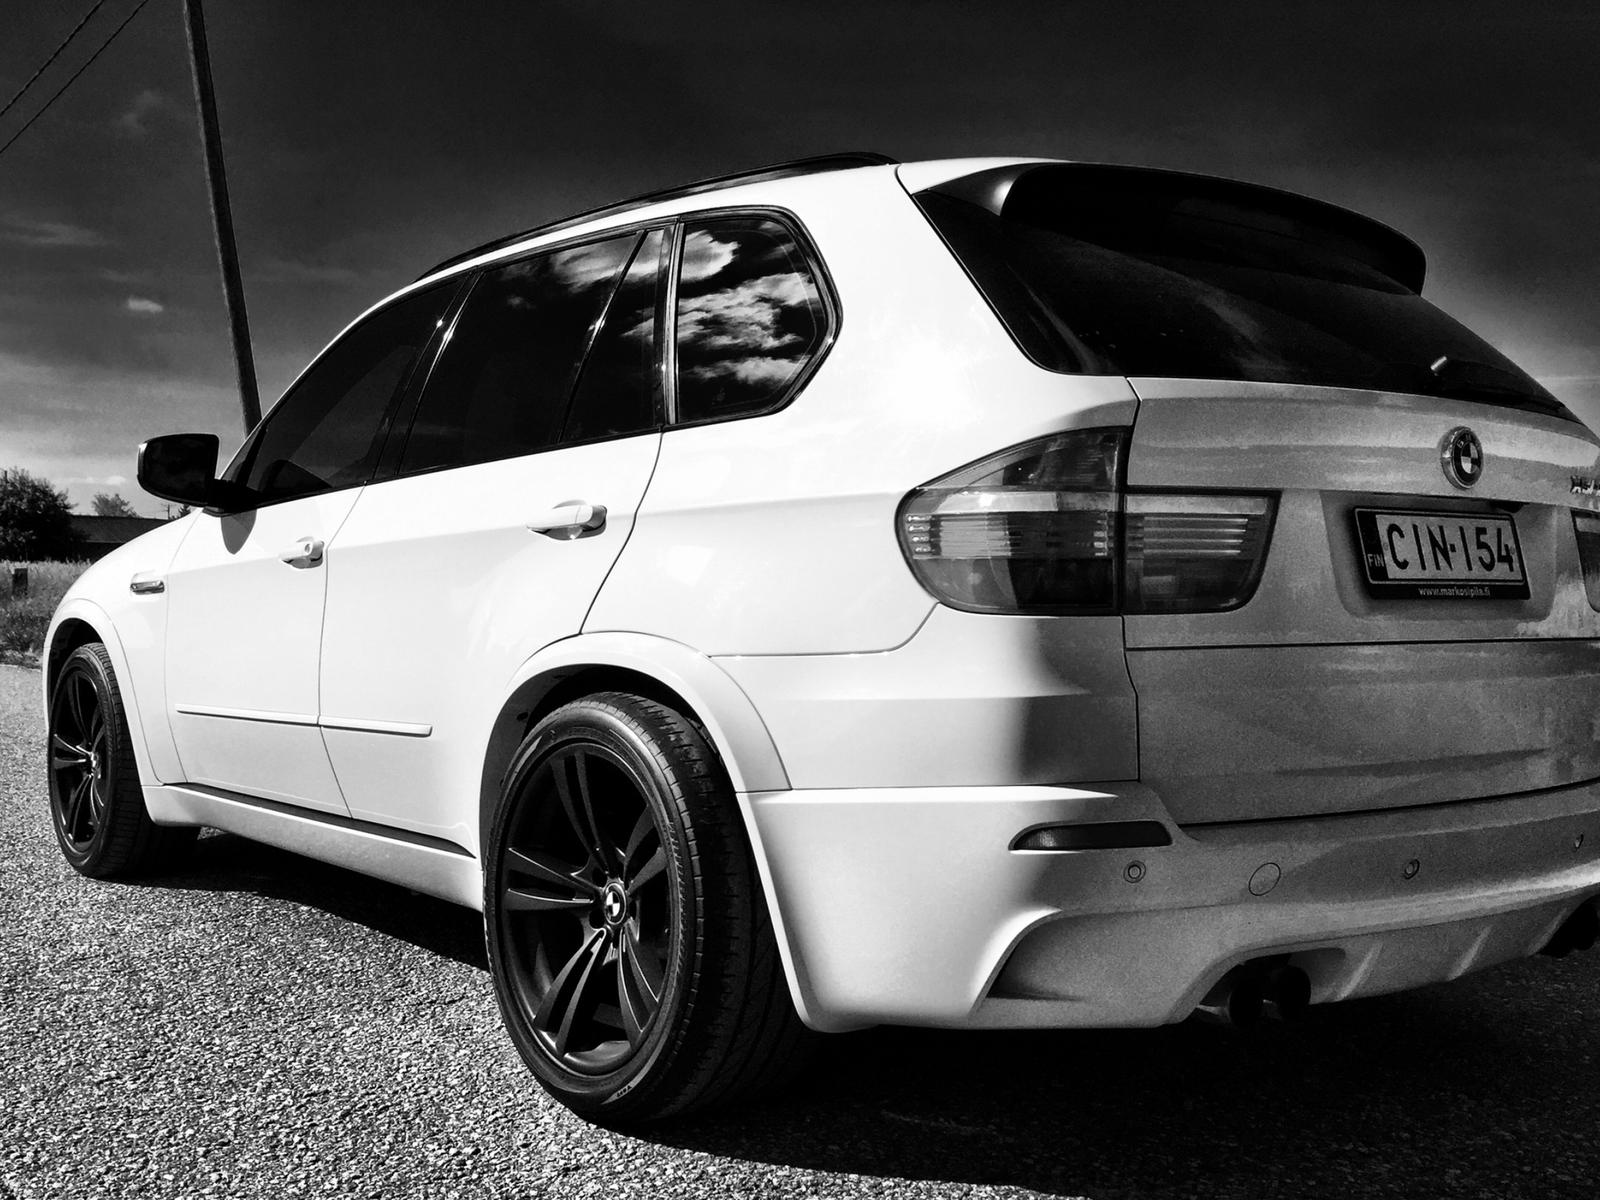 BMW X5 M 2009  620hv PP-Performance Stage